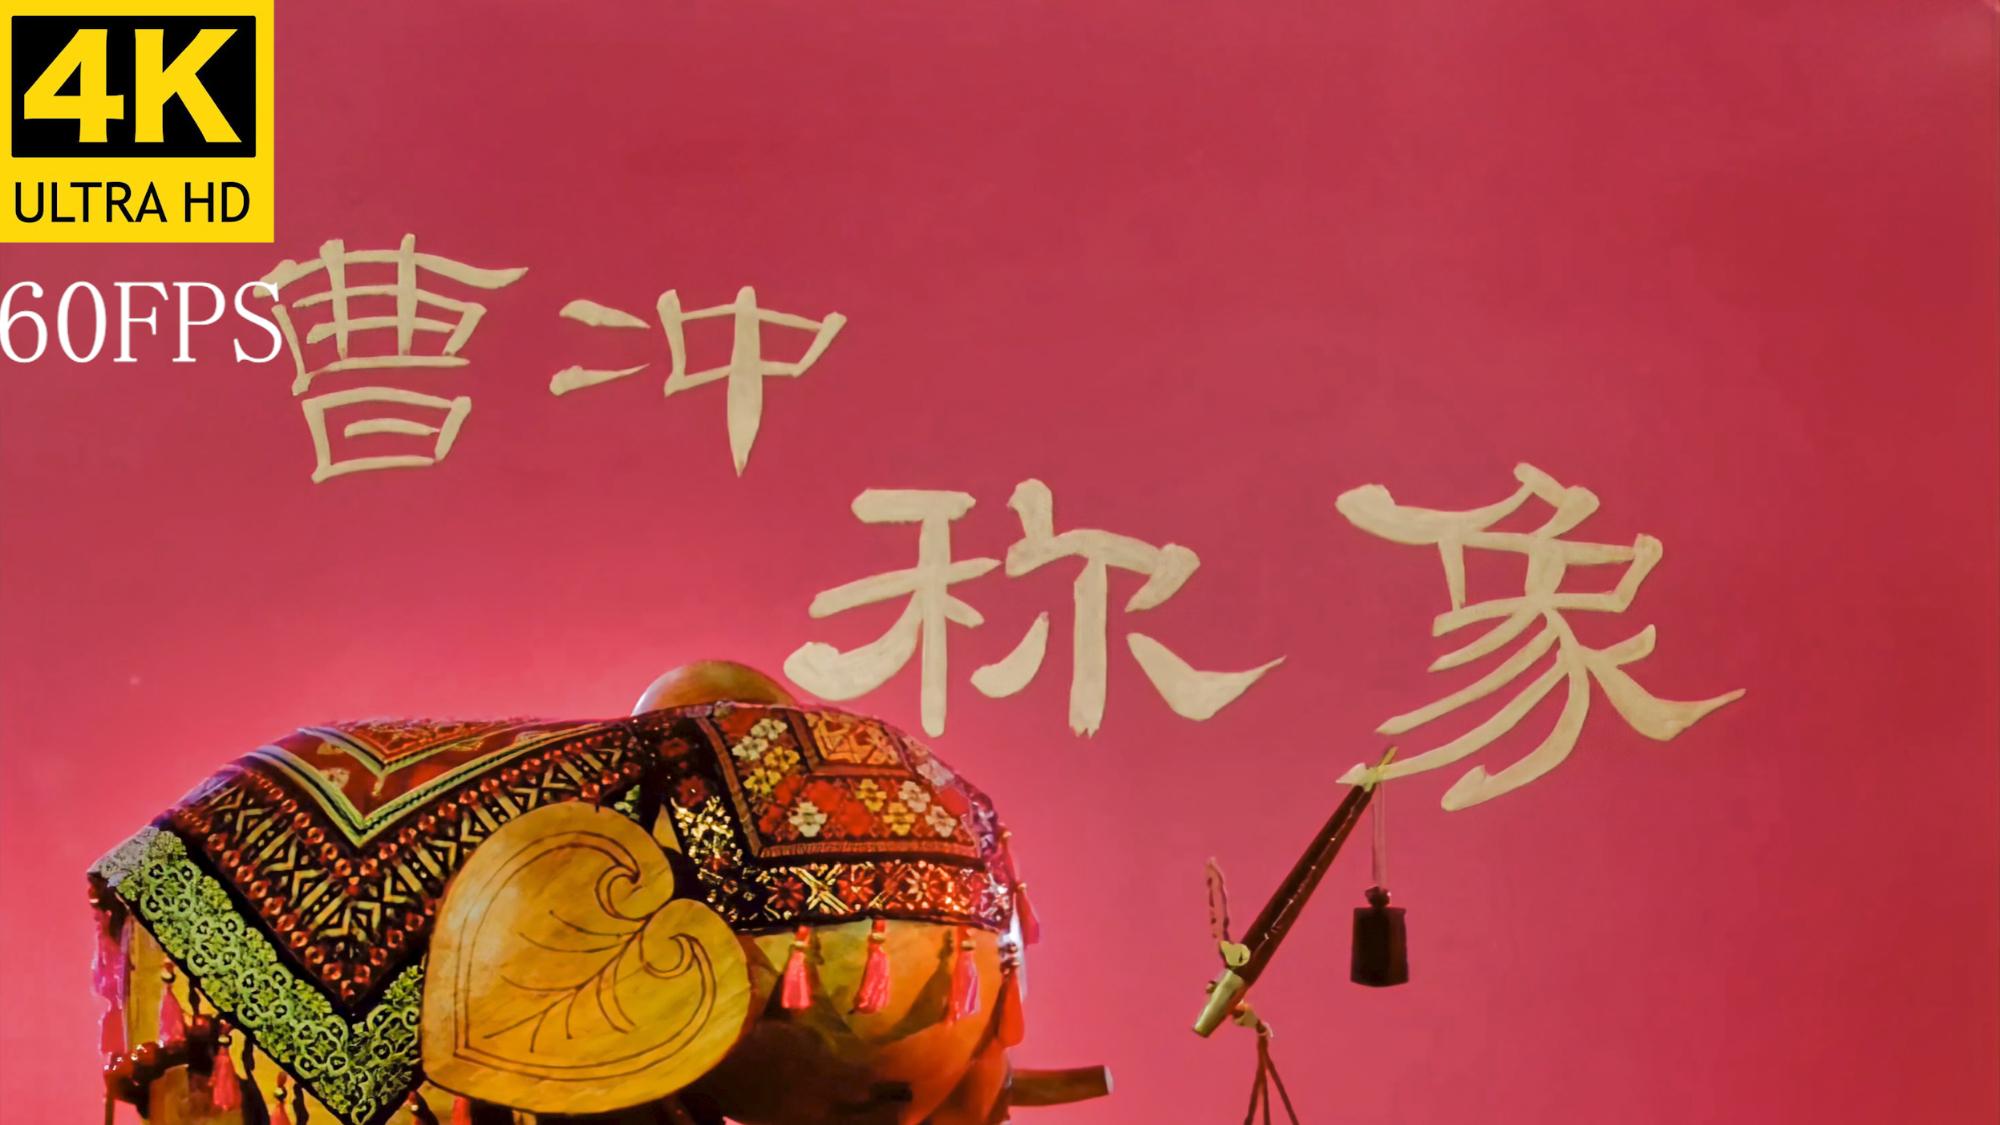 【4k修复60帧】国产经典动画—曹冲称象 【极品收藏级画质】